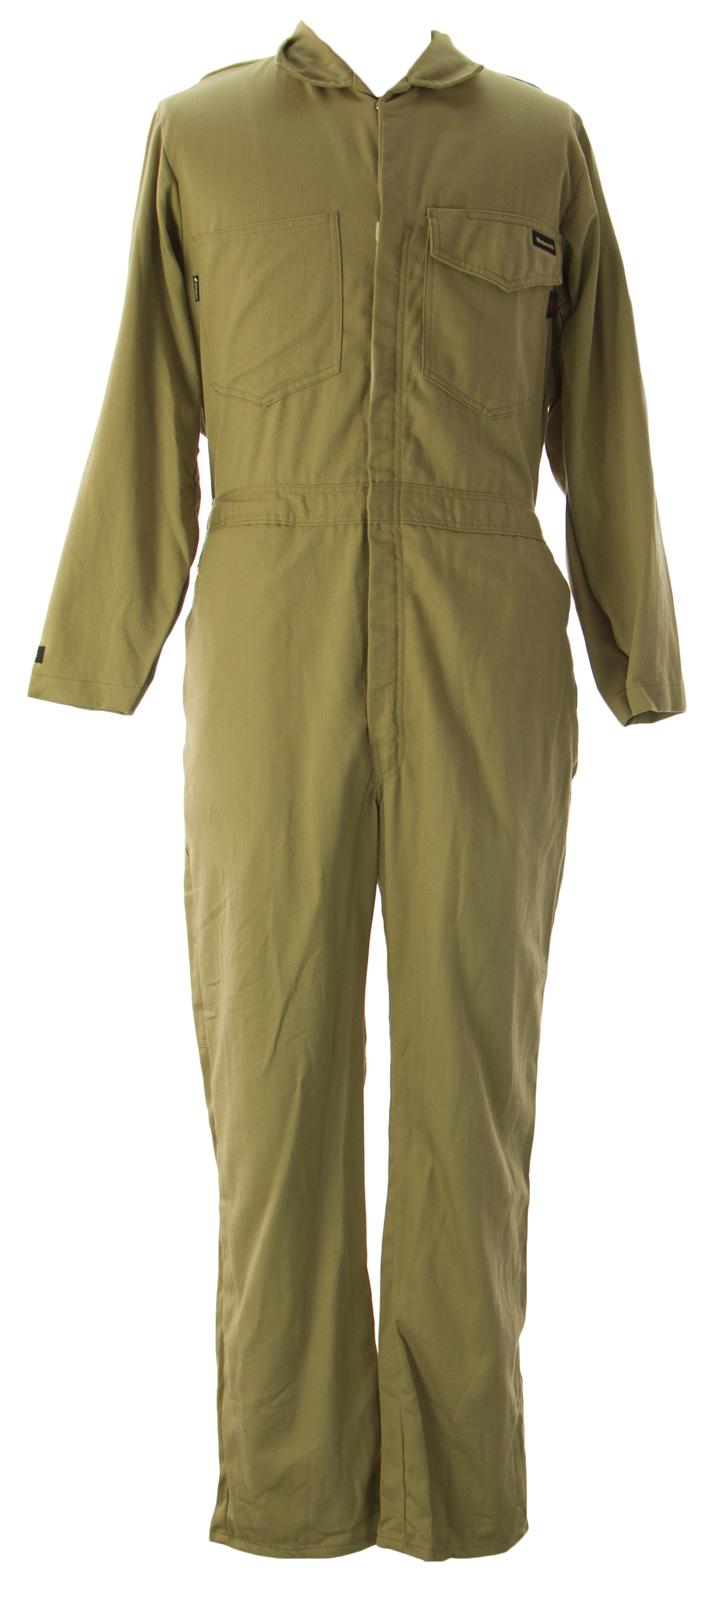 WORKRITE Men's Flame Resistant Coveralls Khaki by 131UT70KH